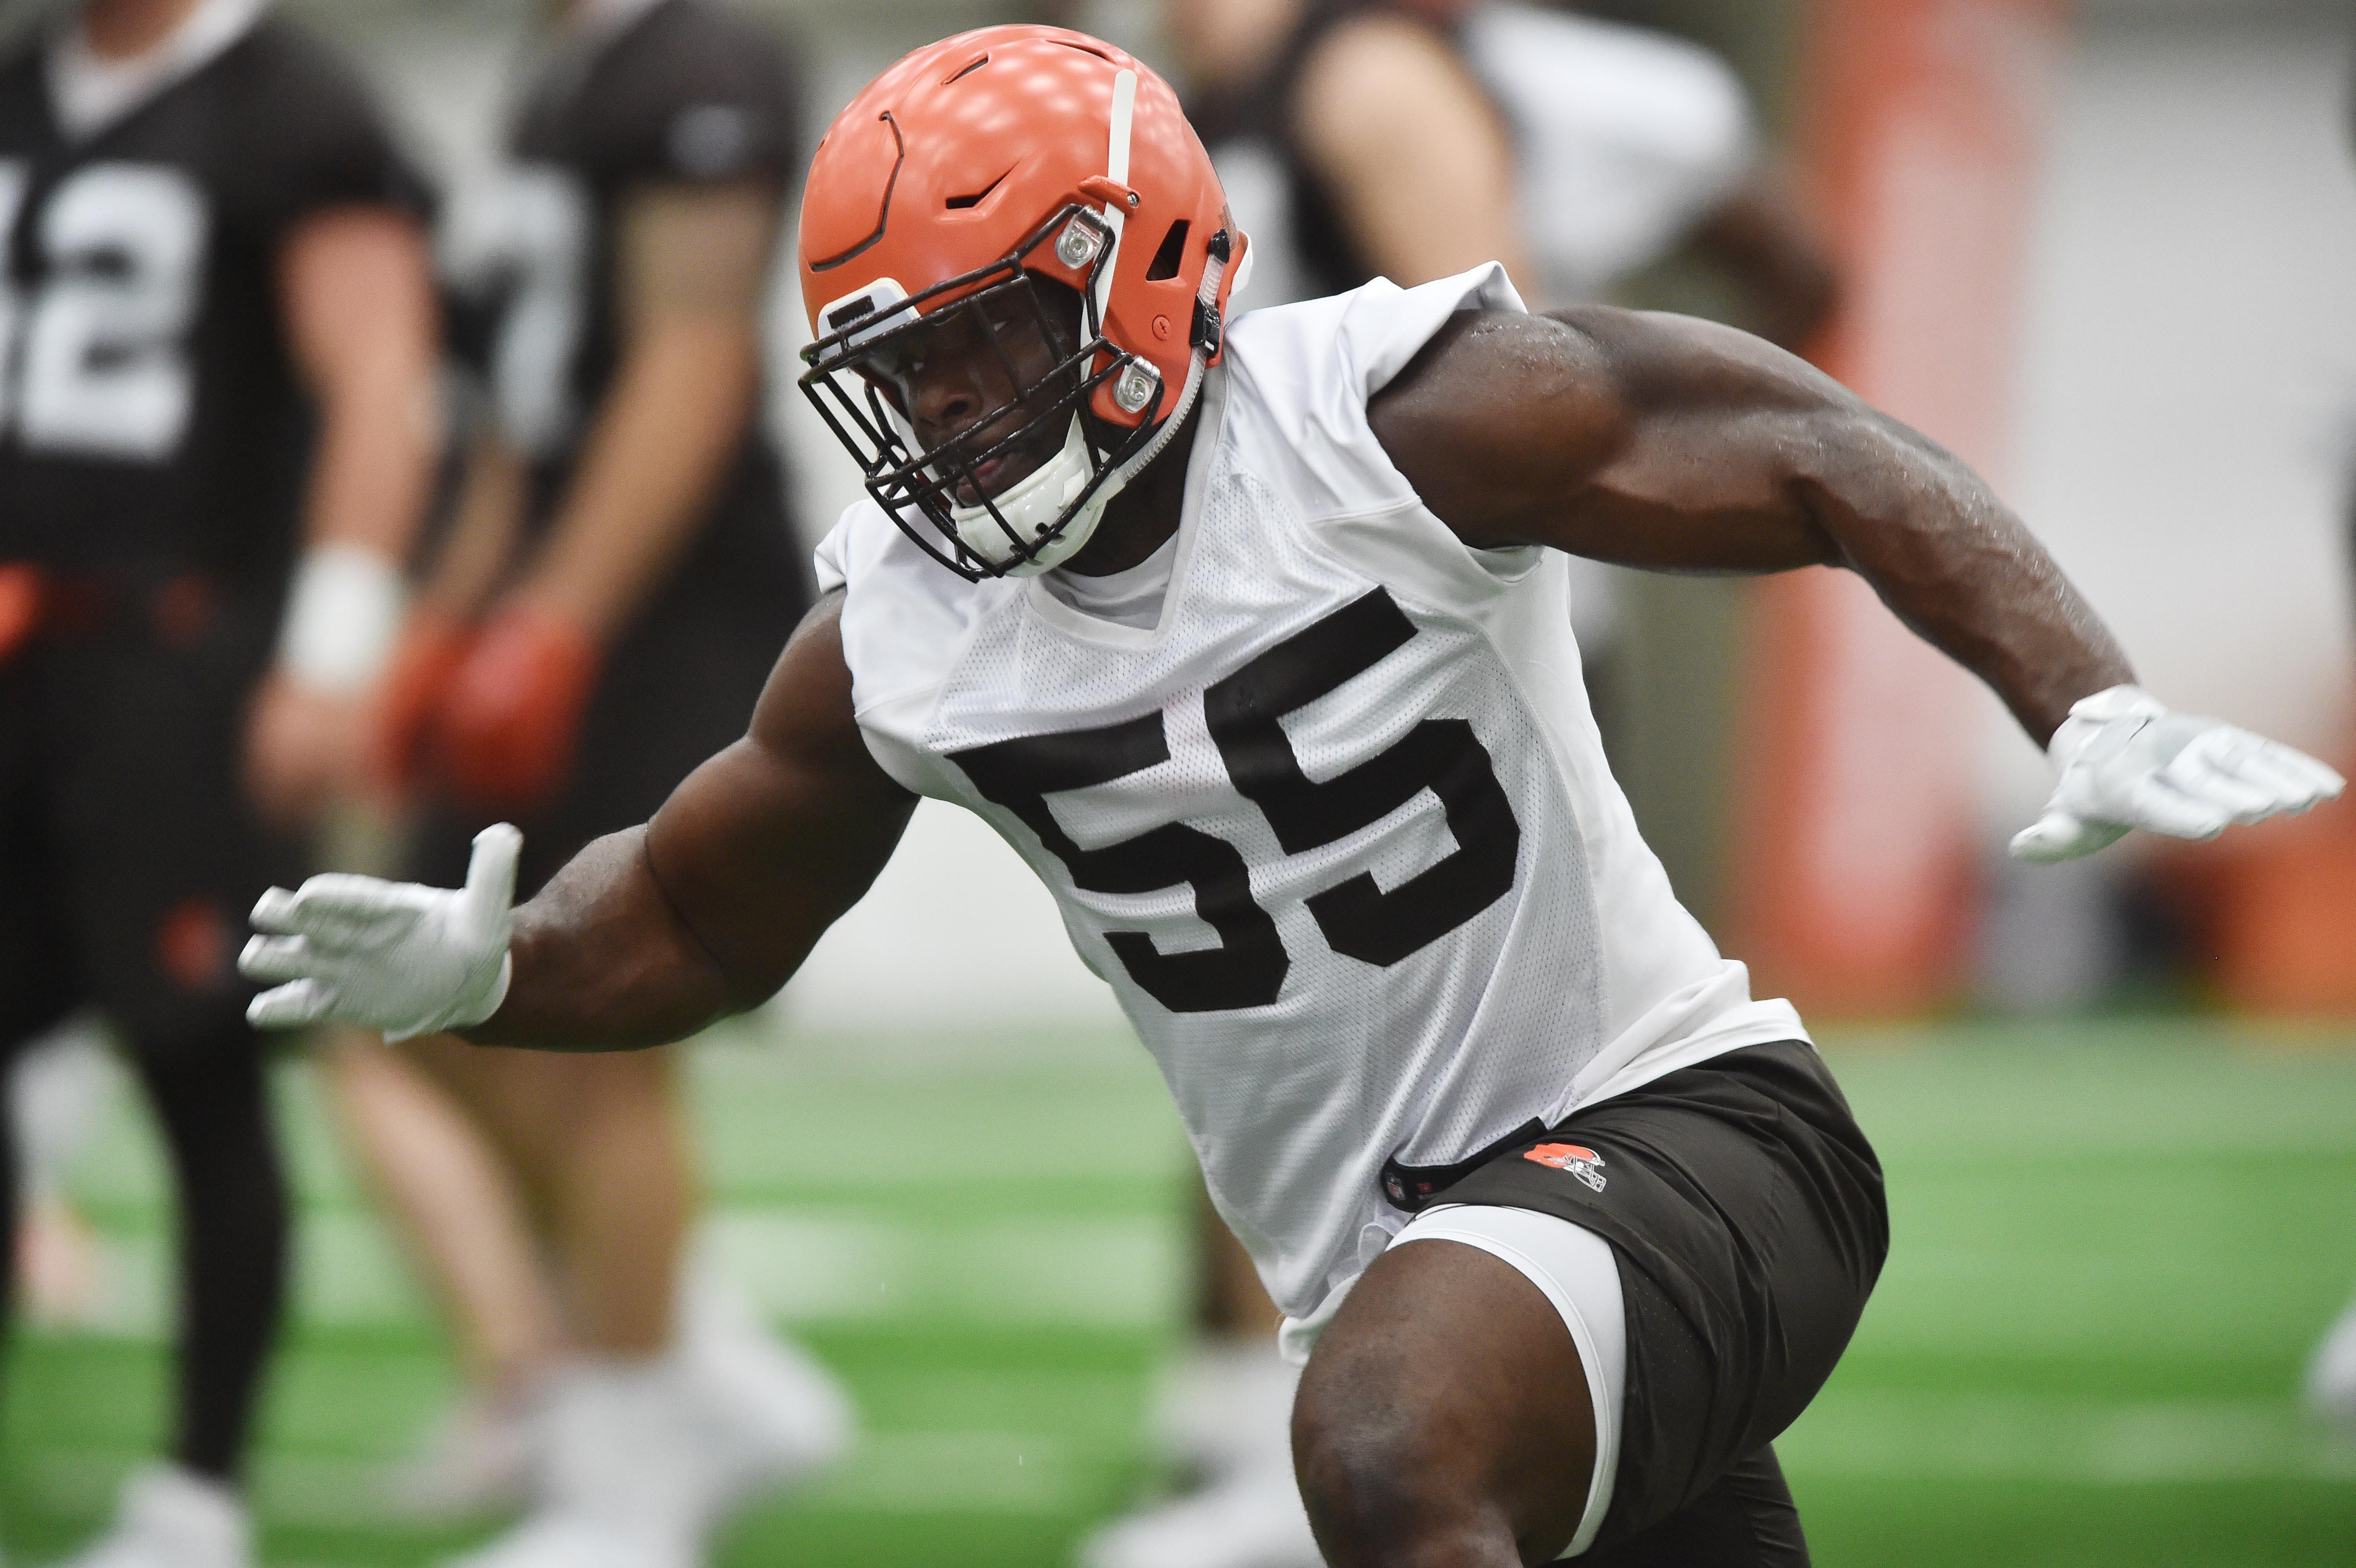 NFL: Cleveland Browns-Rookie Minicamp